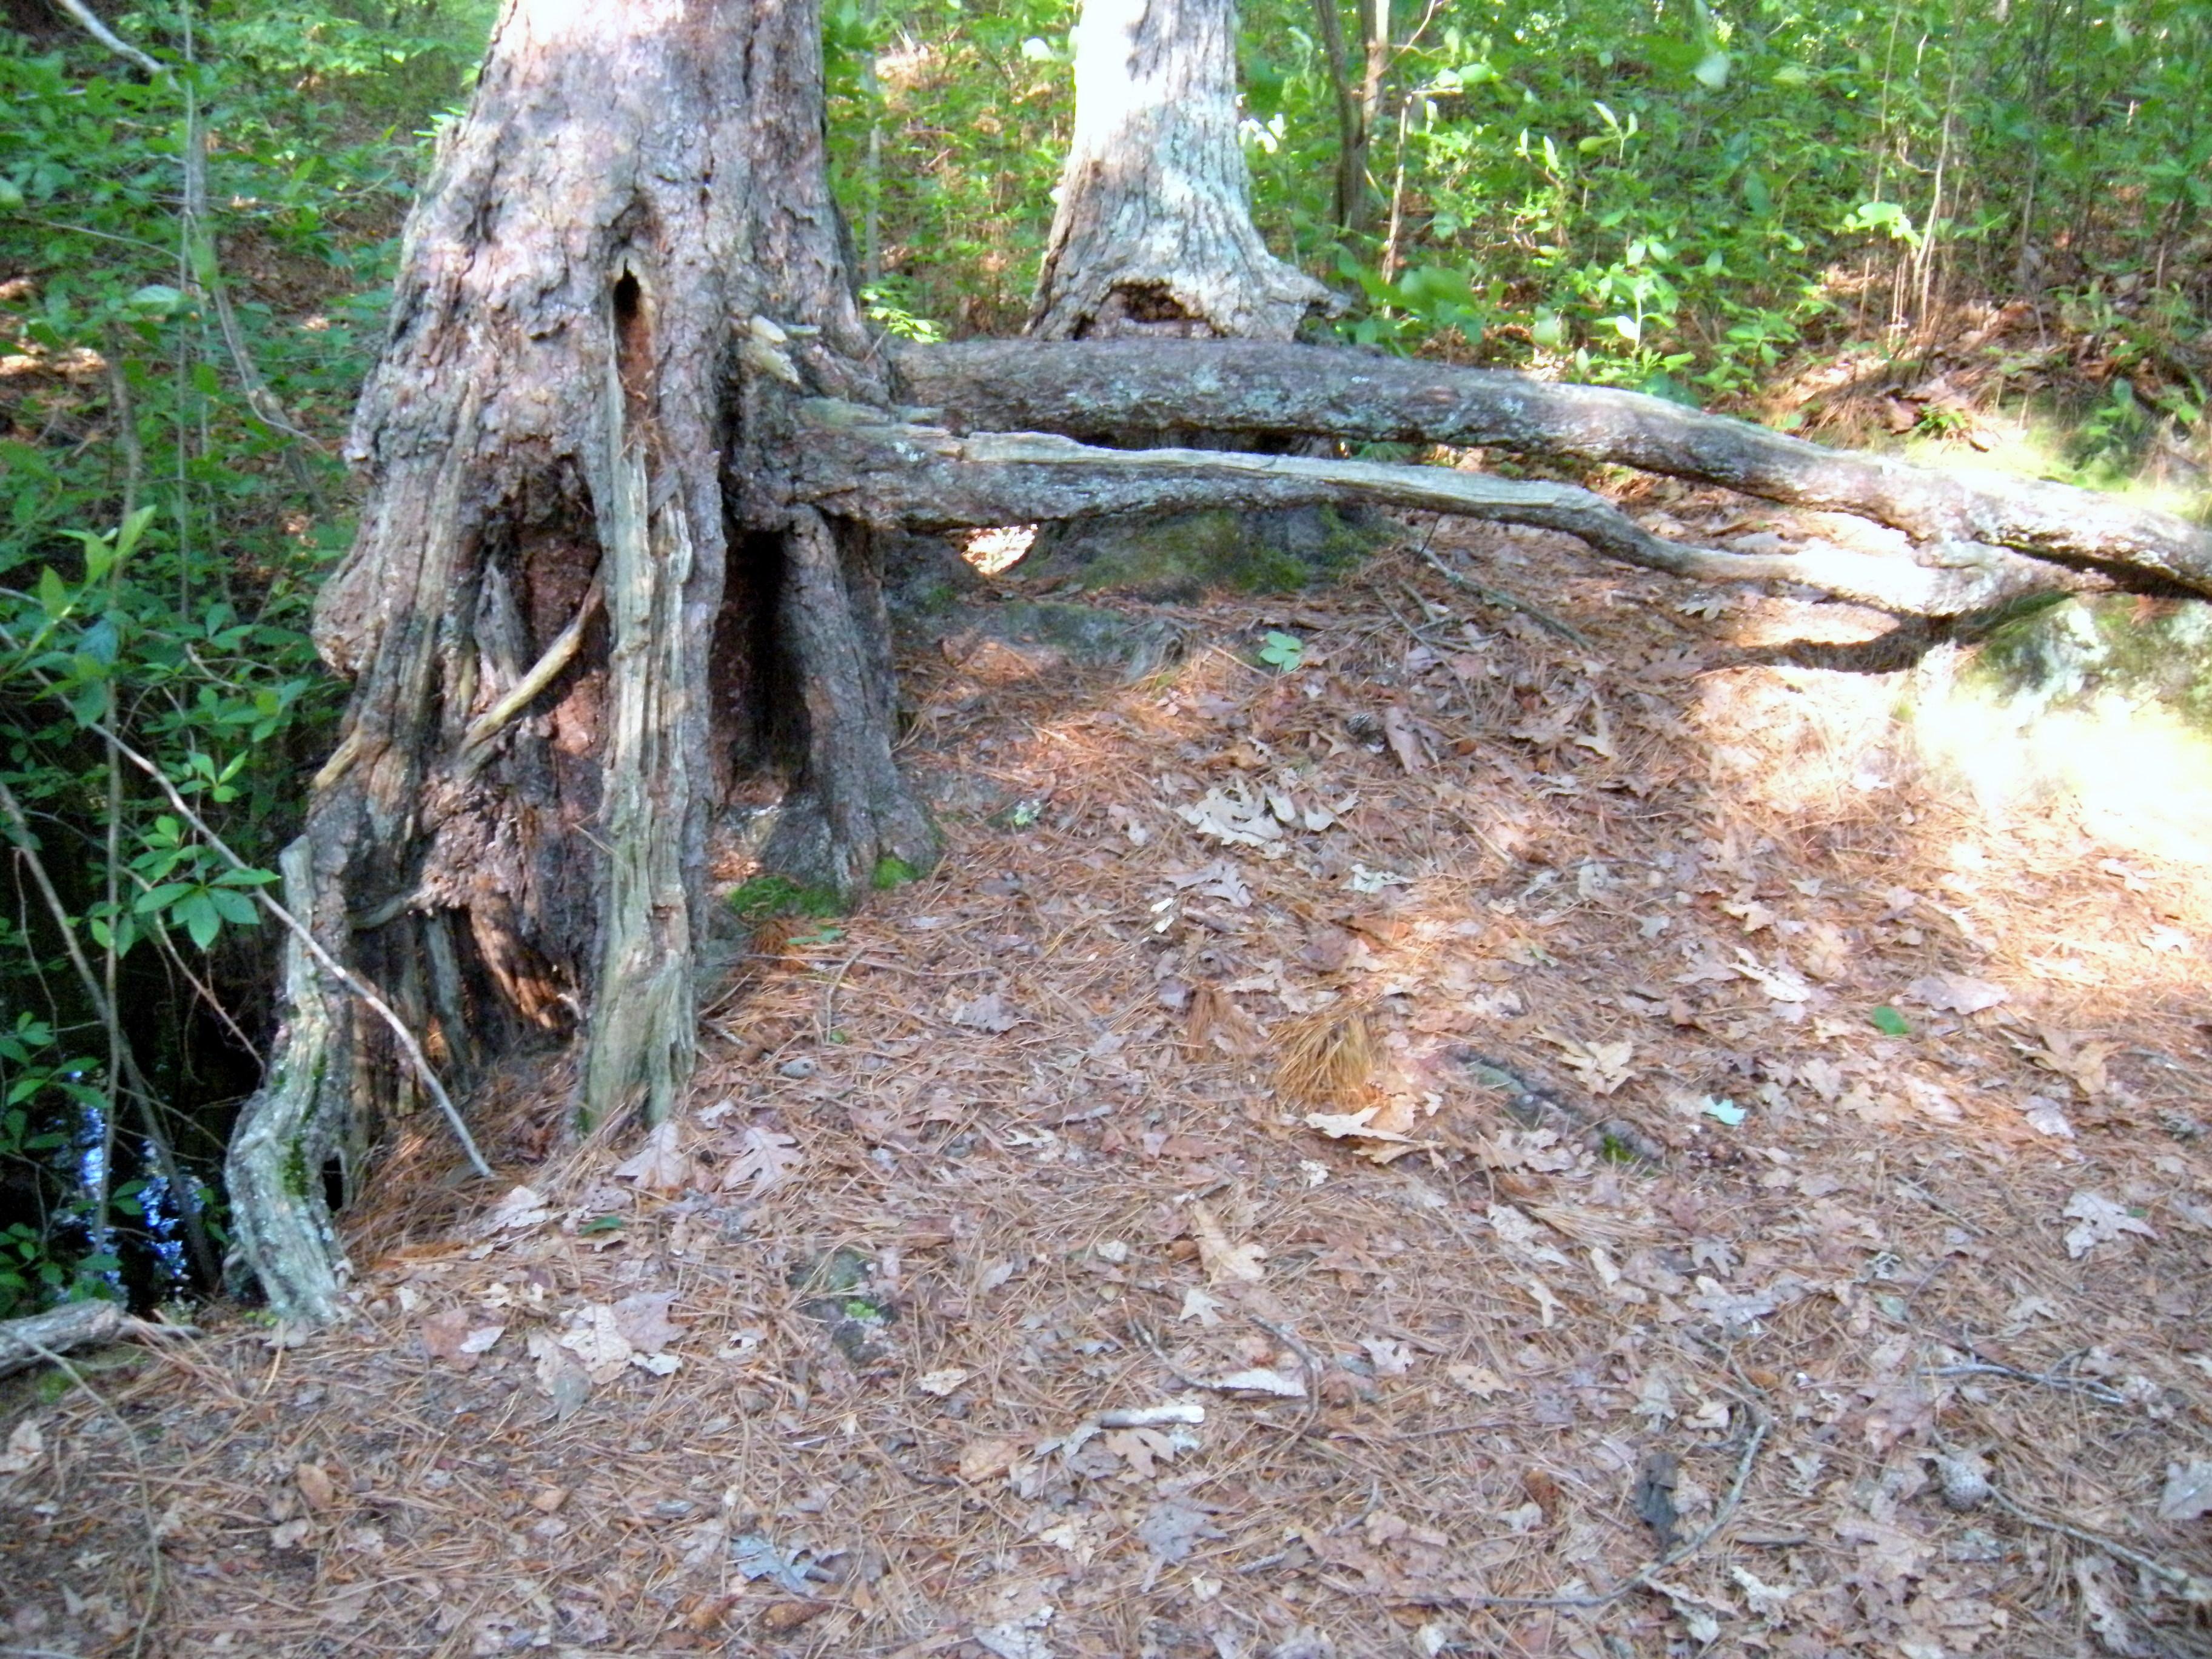 Deformed Tree Stumps